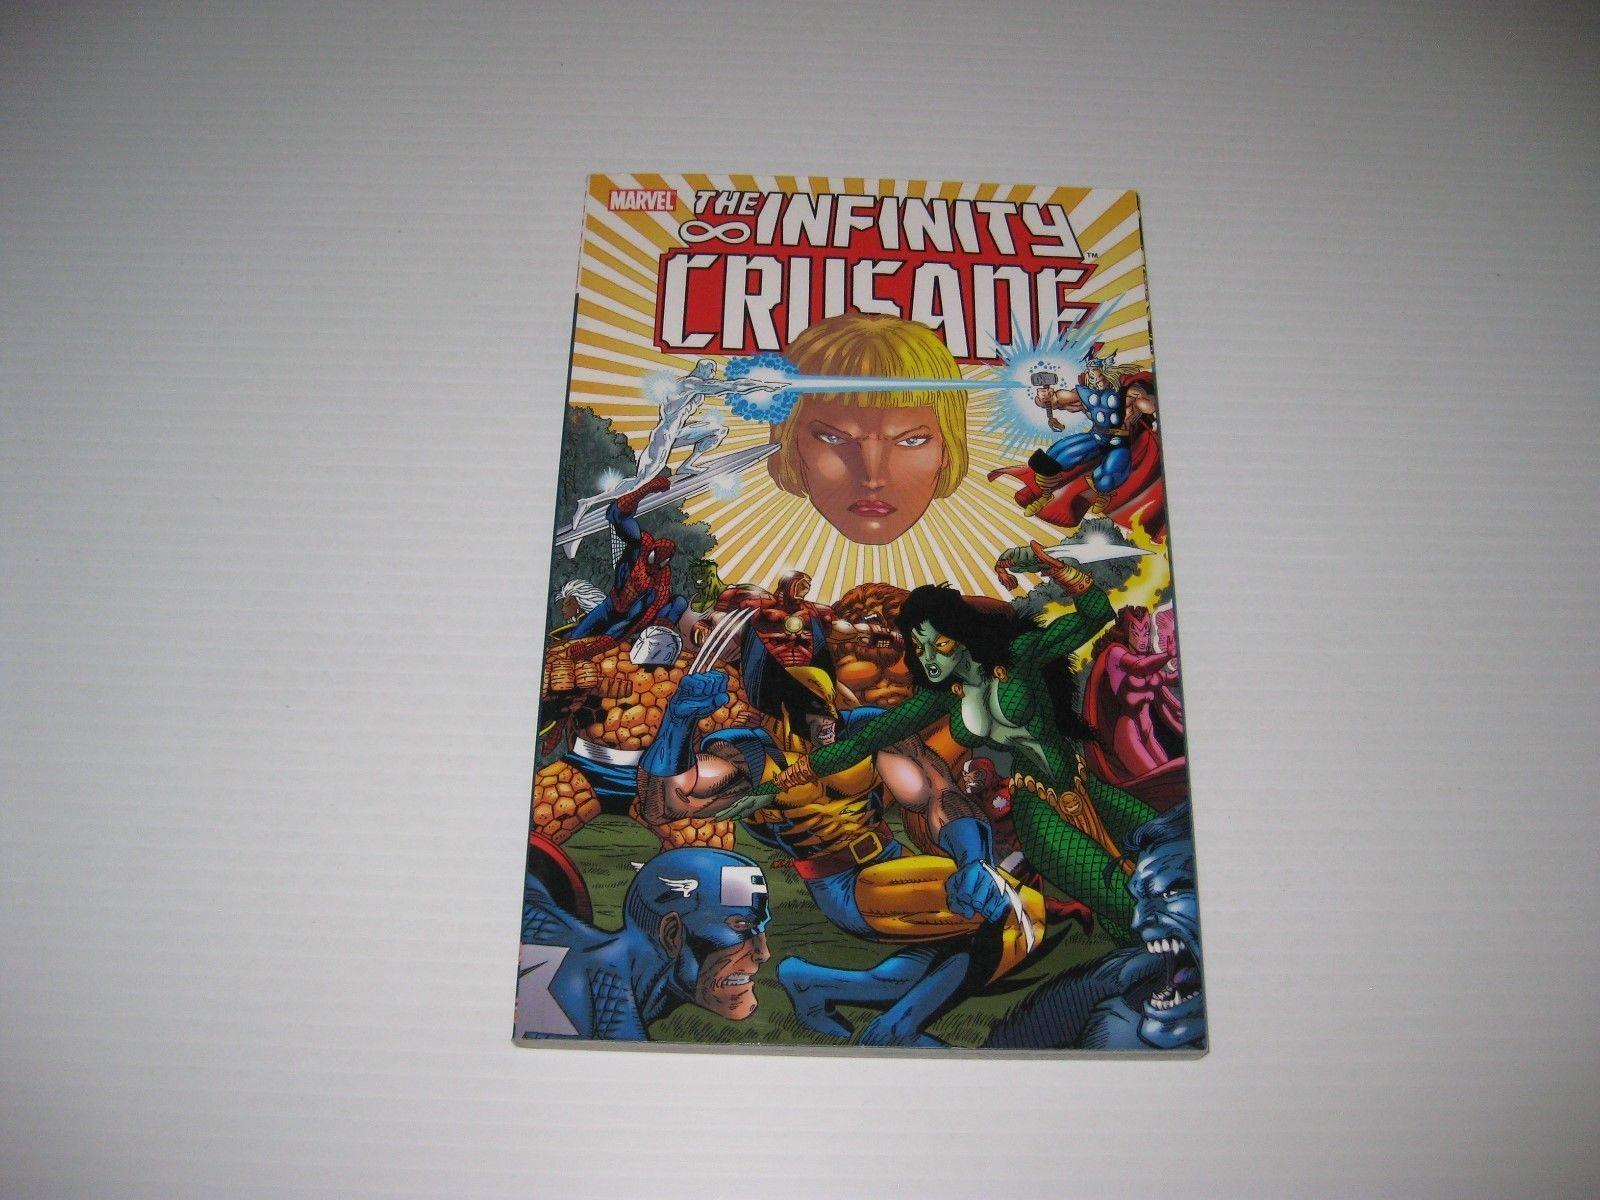 #Popular - INFINITY CRUSADE Vol 2 Marvel Comics TPB Graphic Novel Thanos Gauntlet Avengers http://ift.tt/2pgEY1J https://t.co/ZV7WQc1SDv